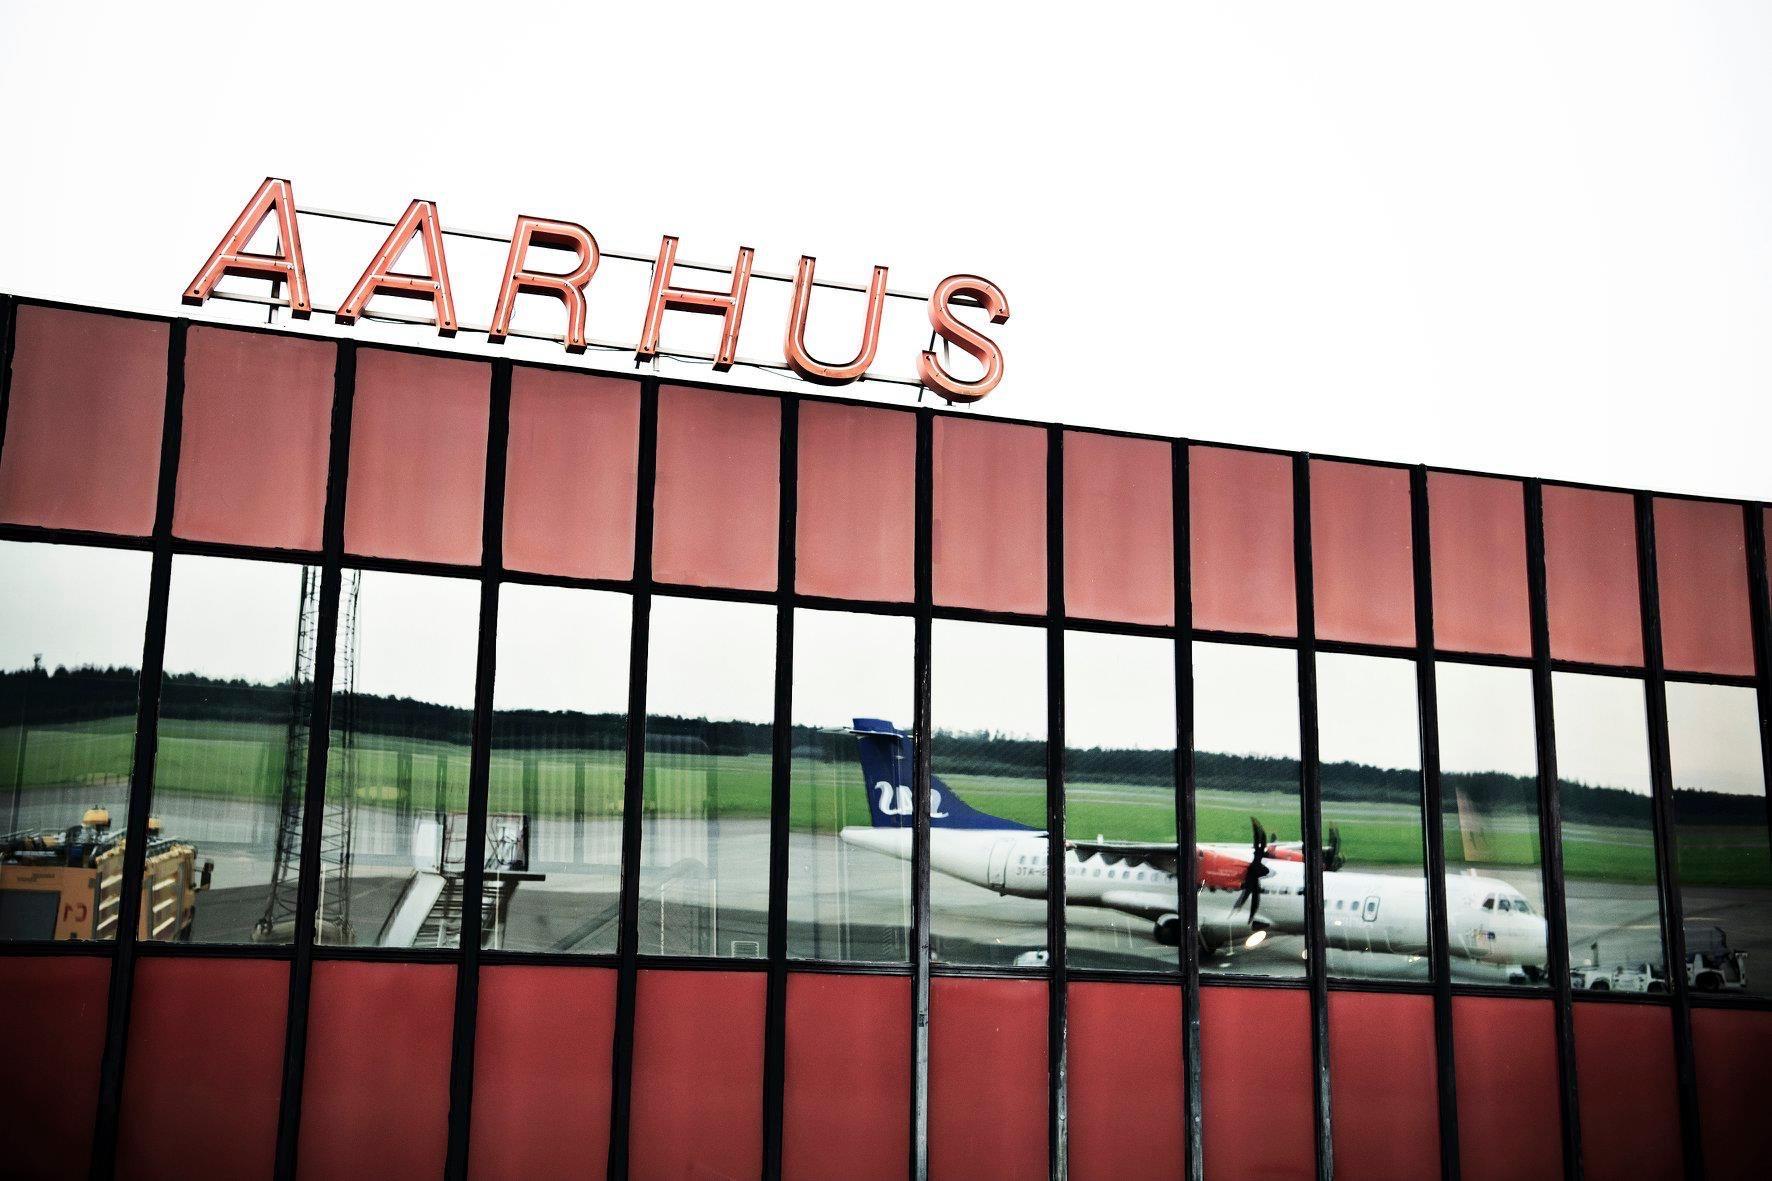 Terminalbygningen i Aarhus Lufthavn. (Foto: Aarhus Airport | Facebook)